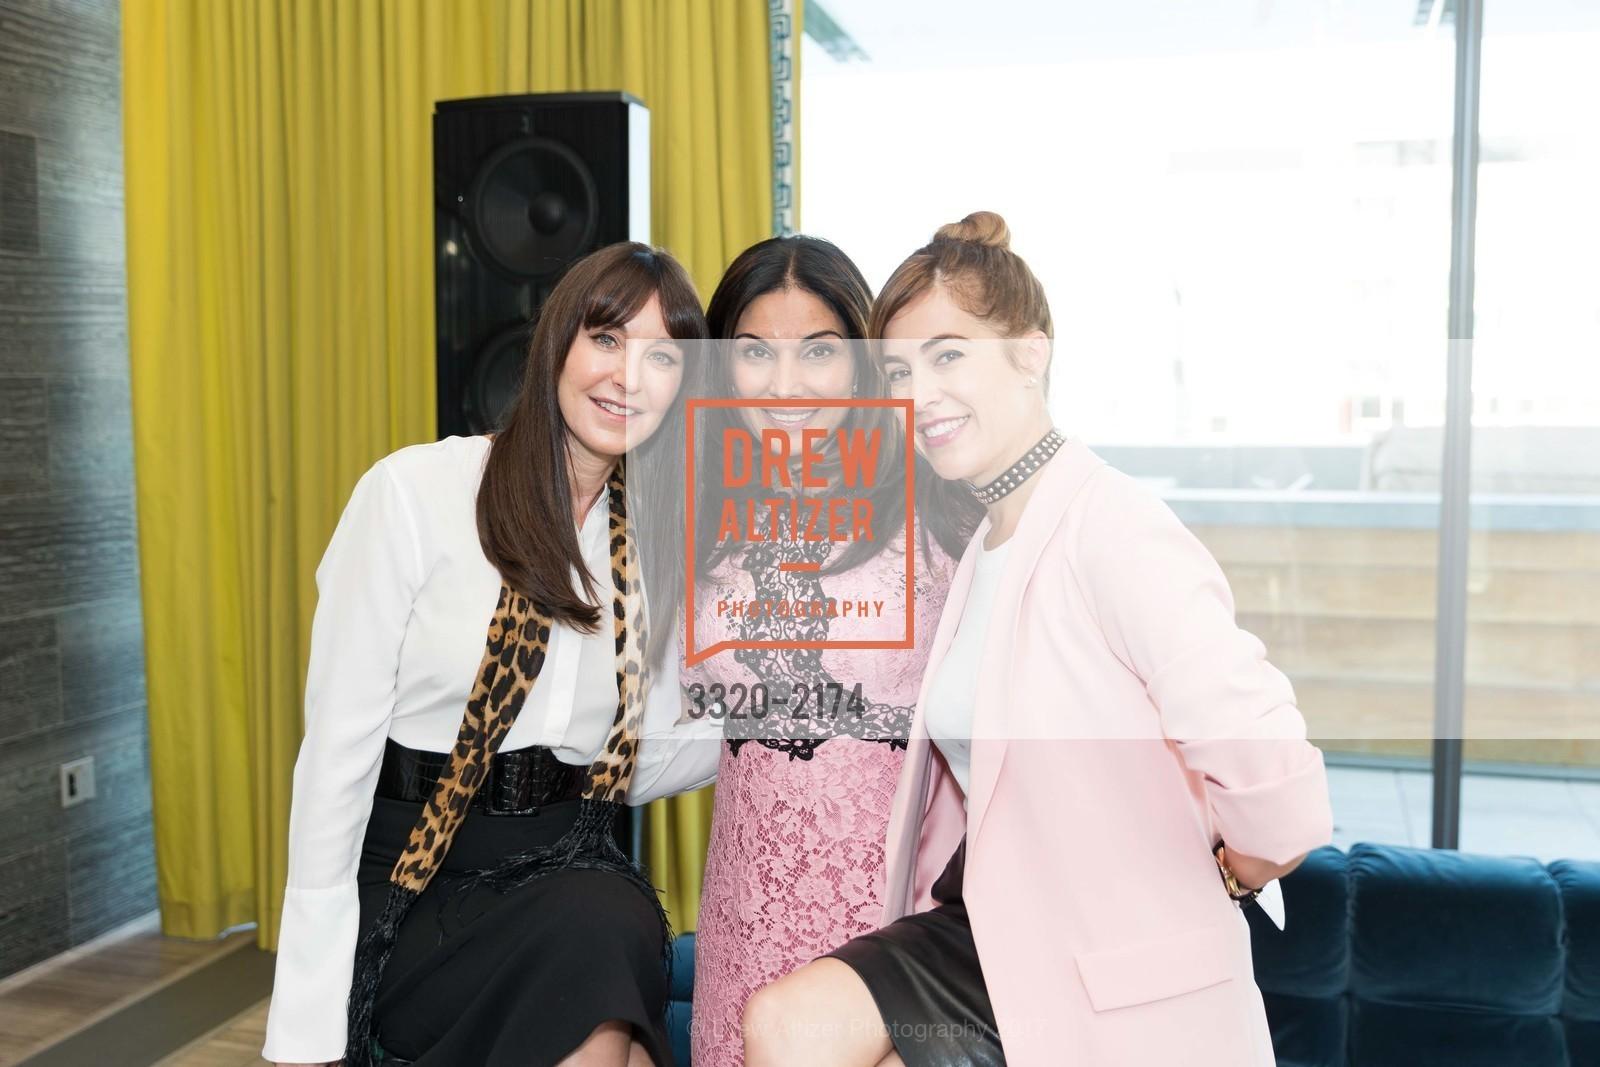 Tamara Collins, Shelly Kapoor Collins, Alison Pincus, Photo #3320-2174